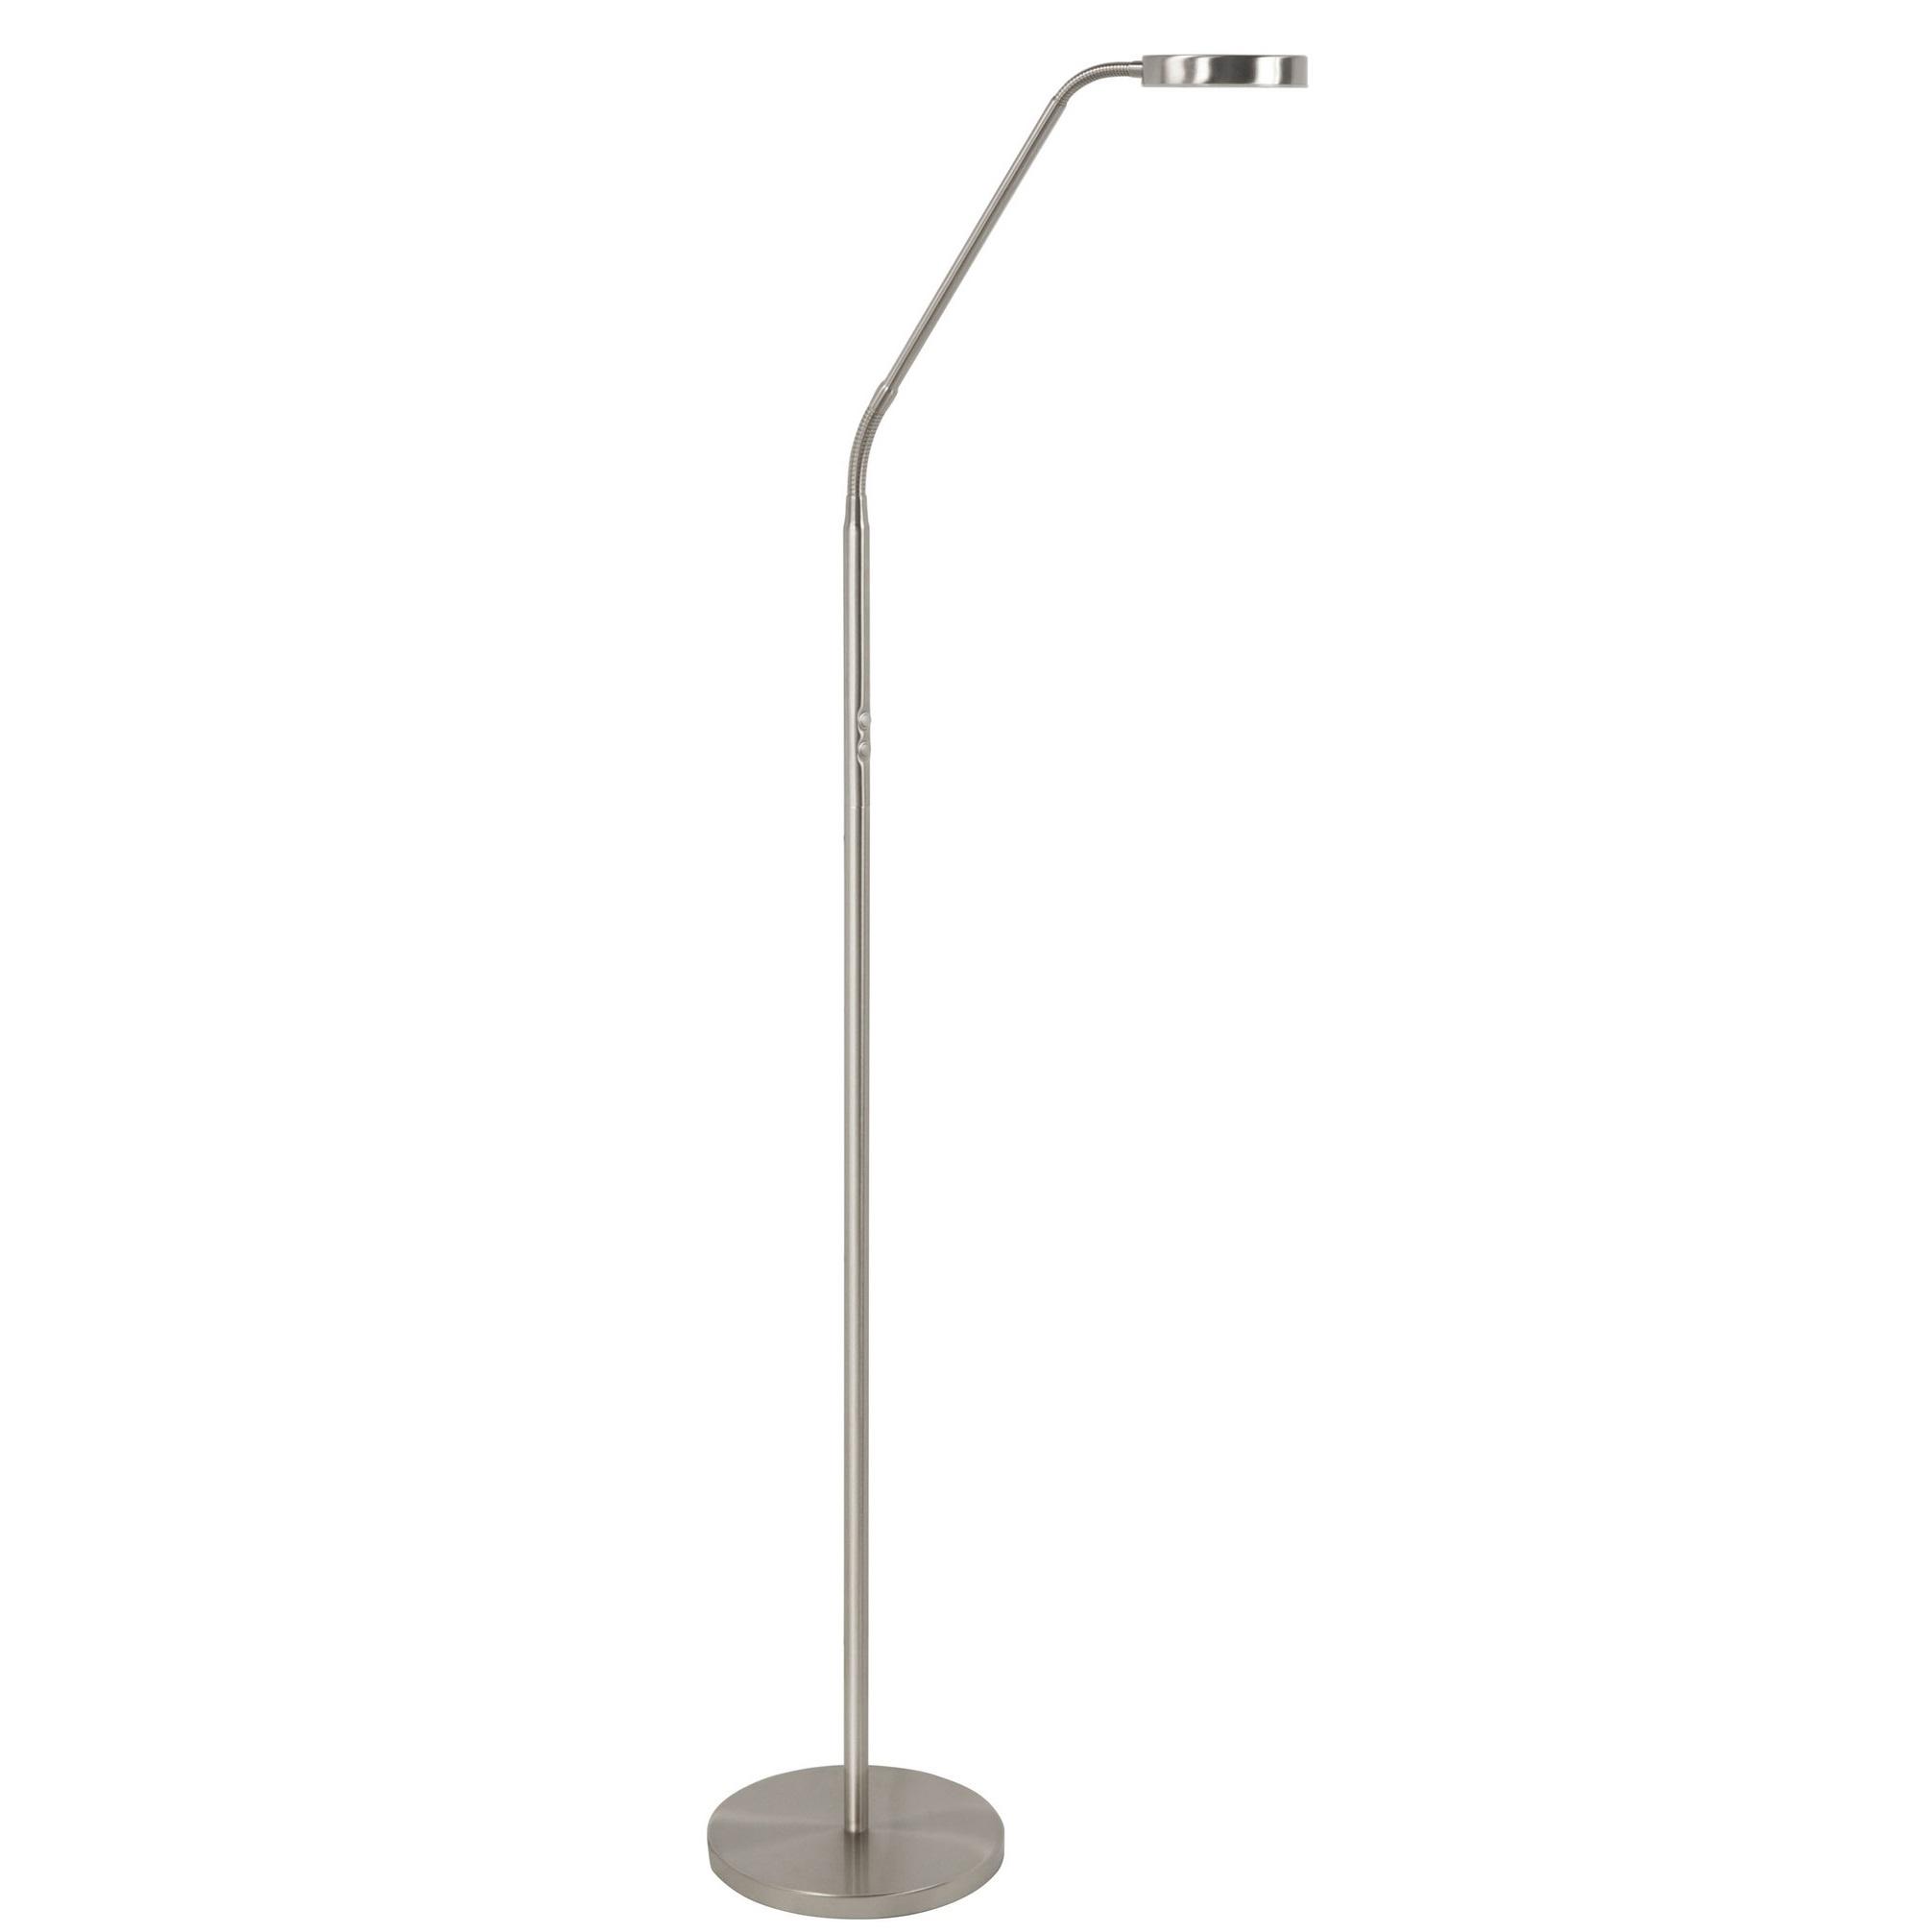 Vloerlamp Comfort RVS Led incl. Dimmer